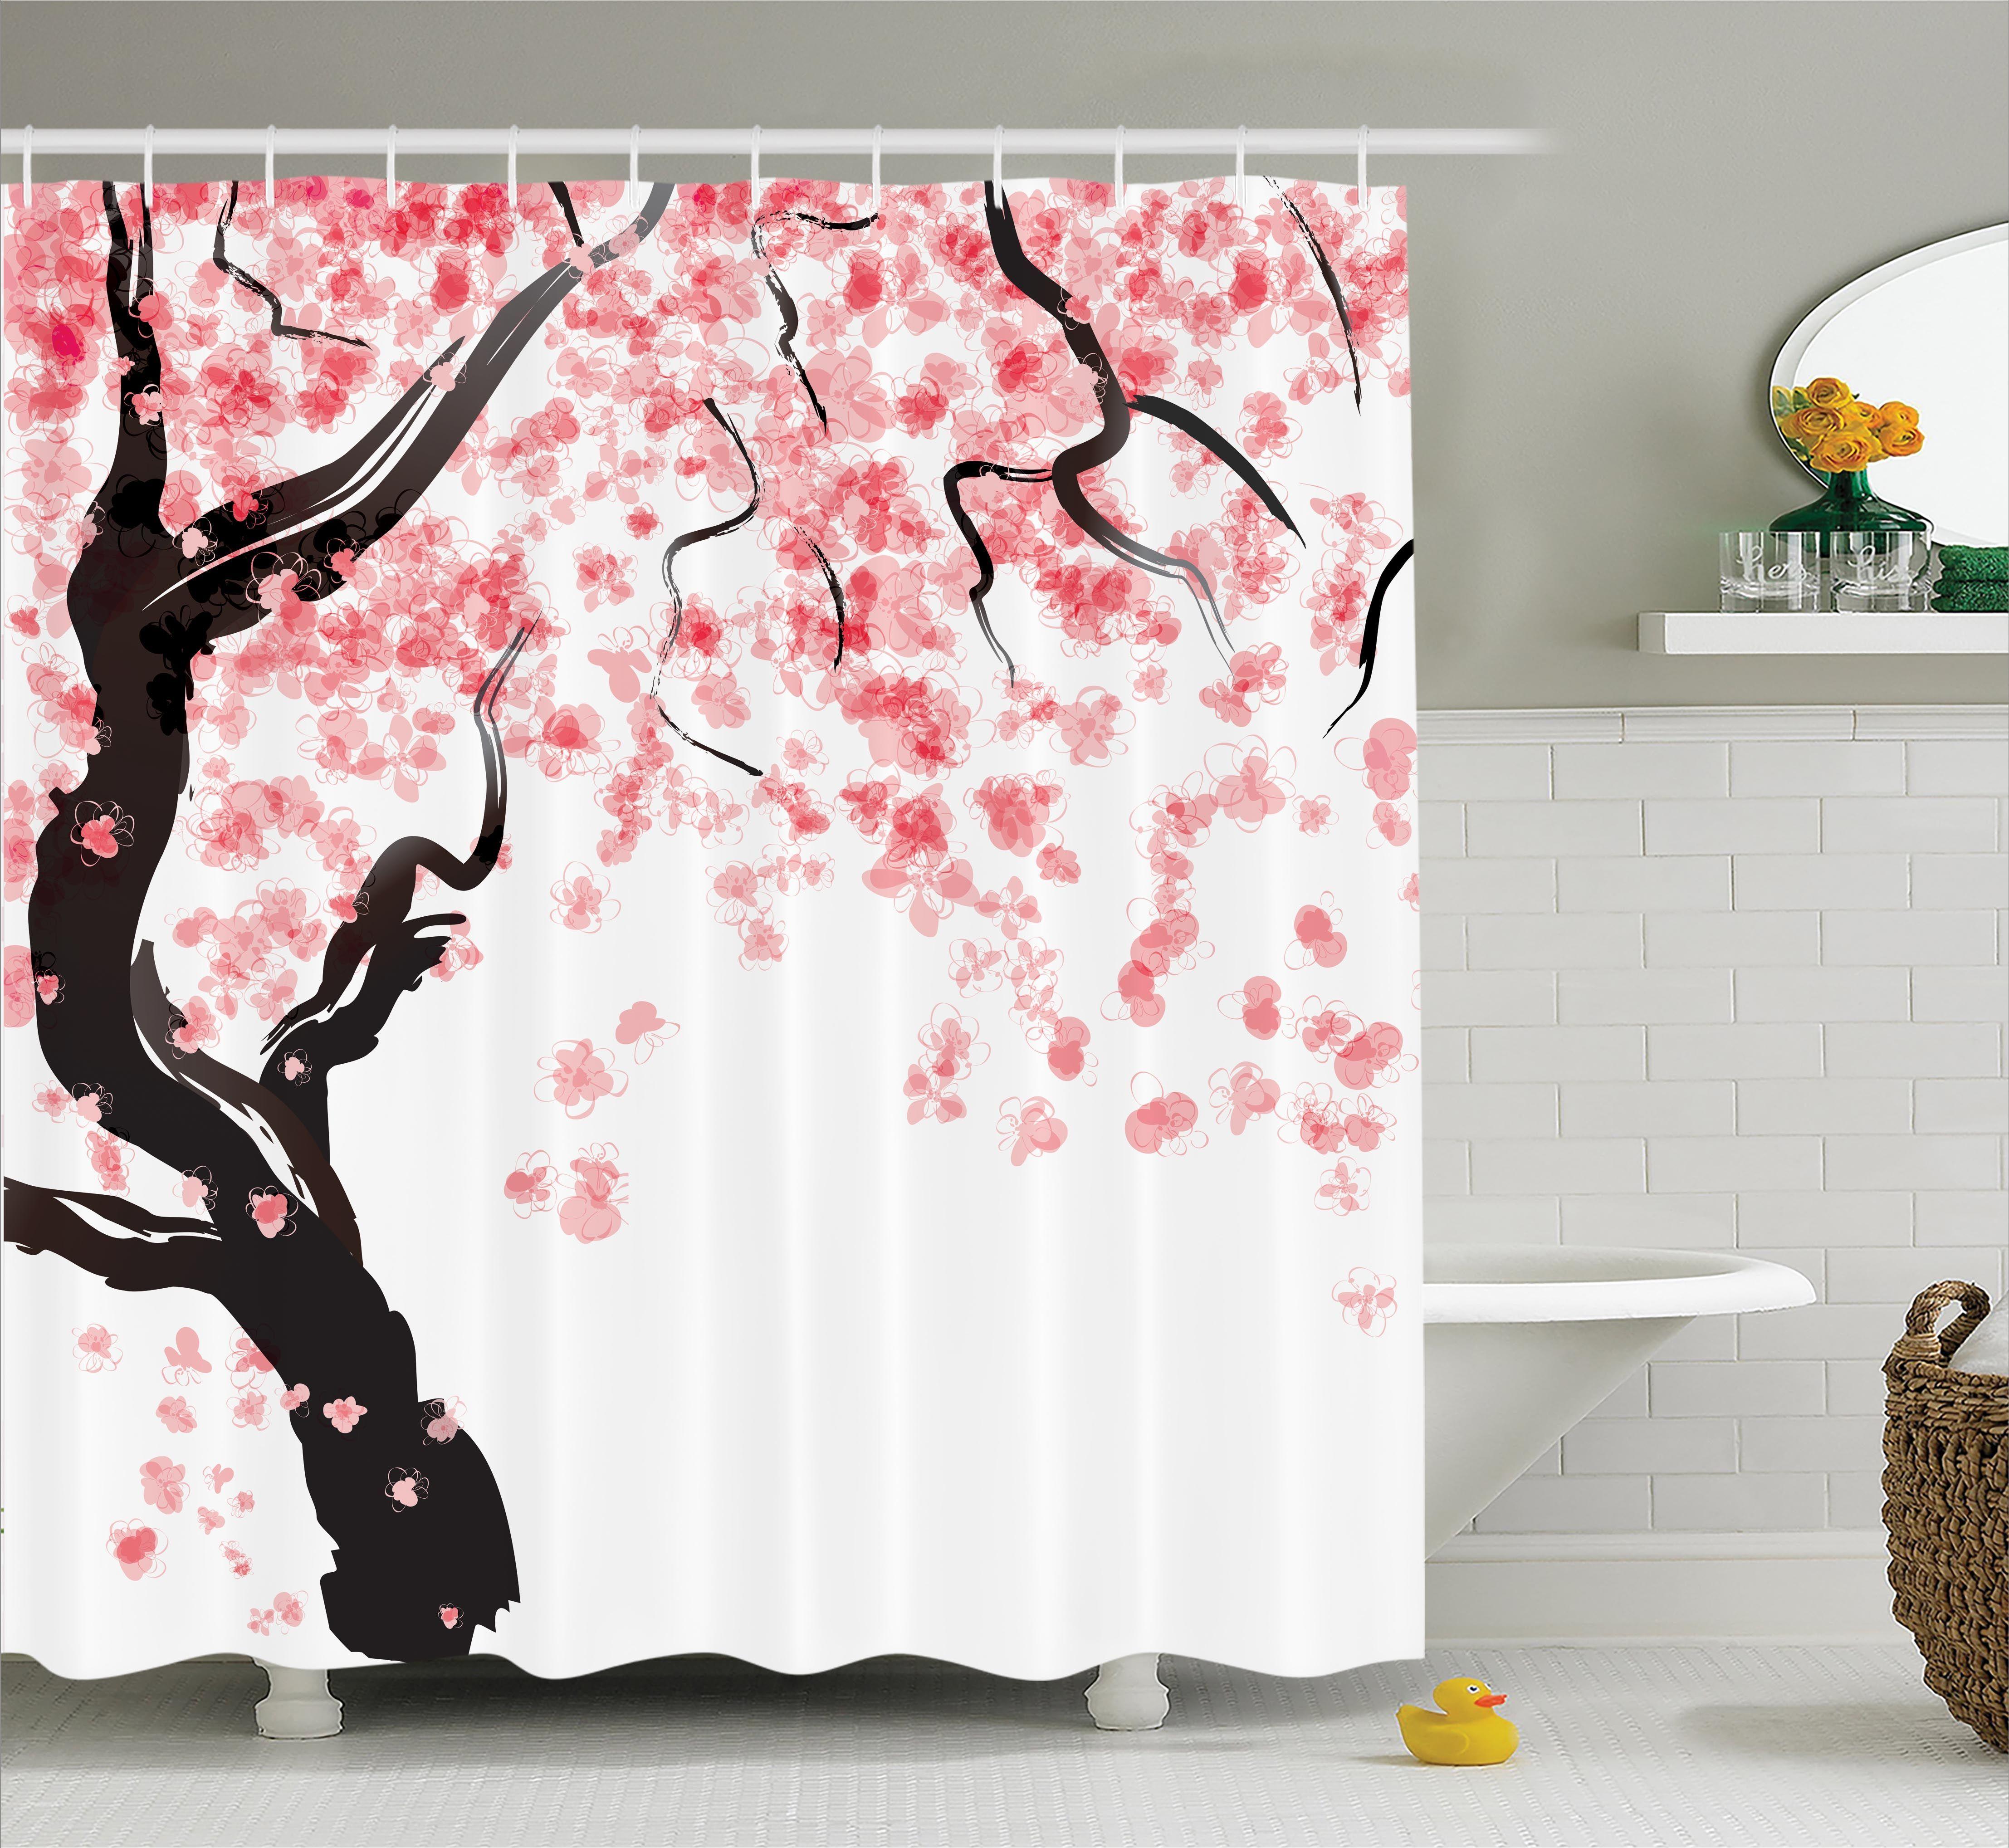 Japanese Decor Shower Curtain Set Japanese Cherry Tree Blossom In